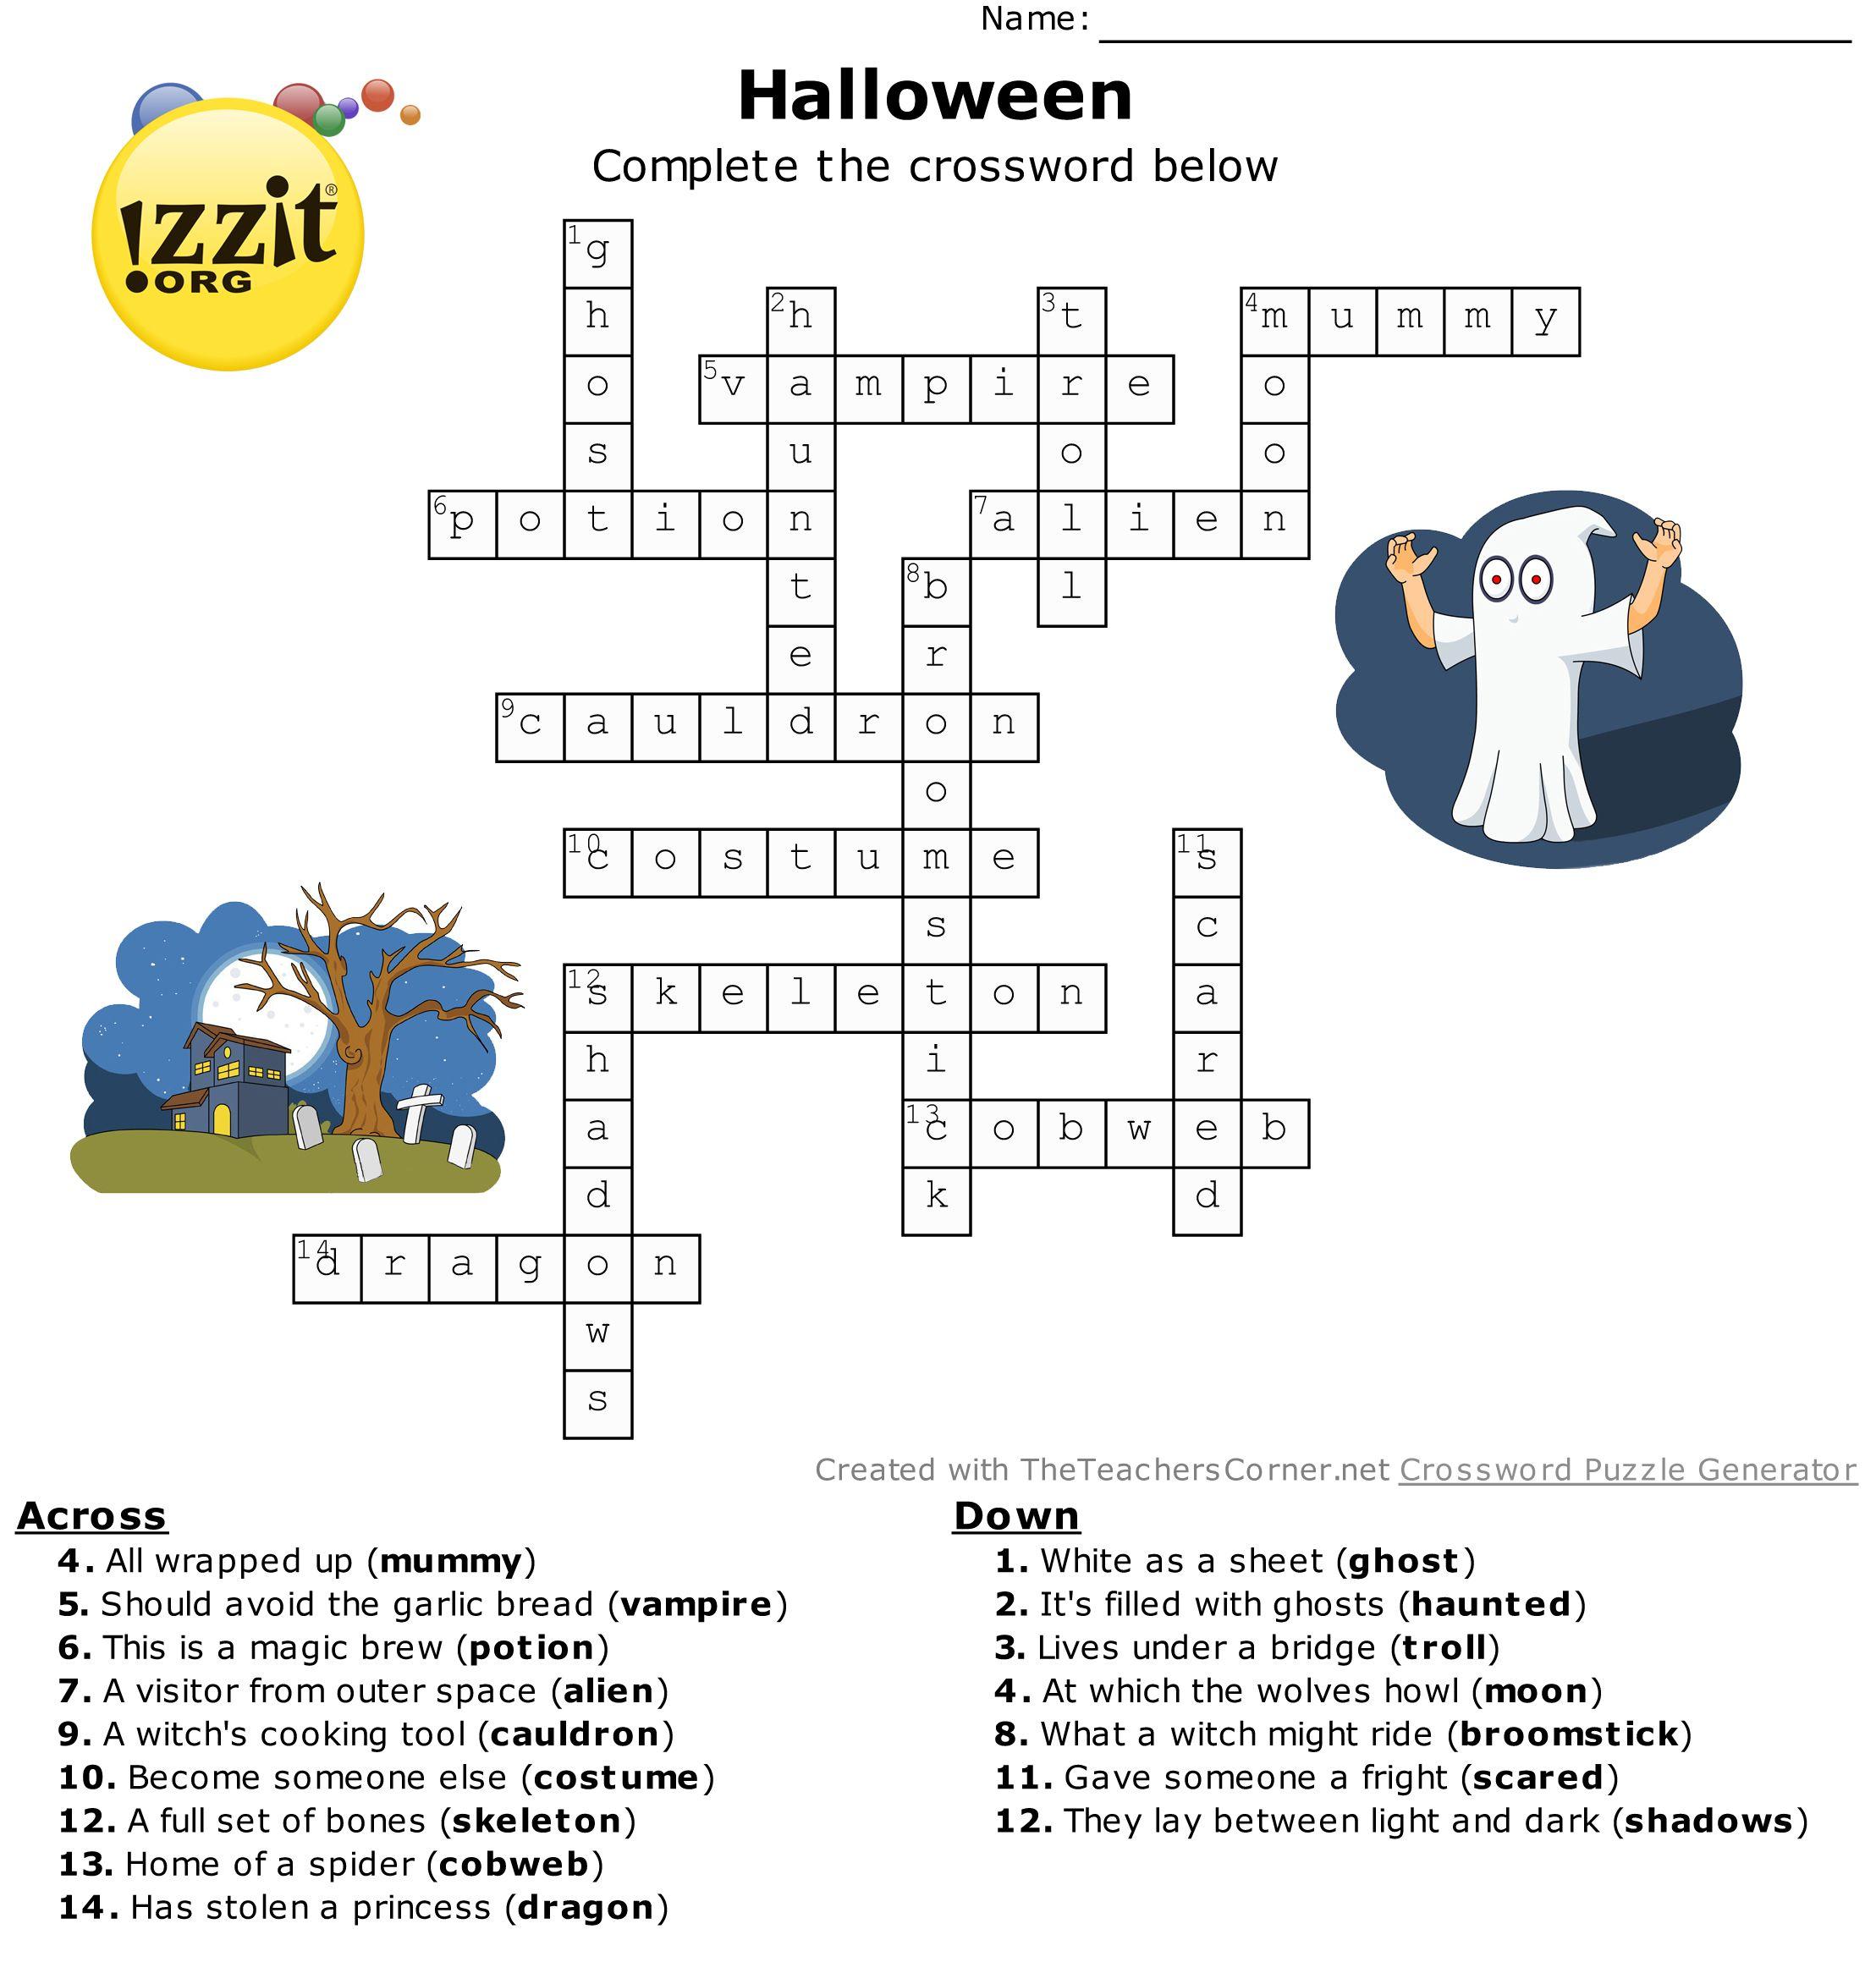 Halloween Crossword Answers - Hard #happyhalloween ???